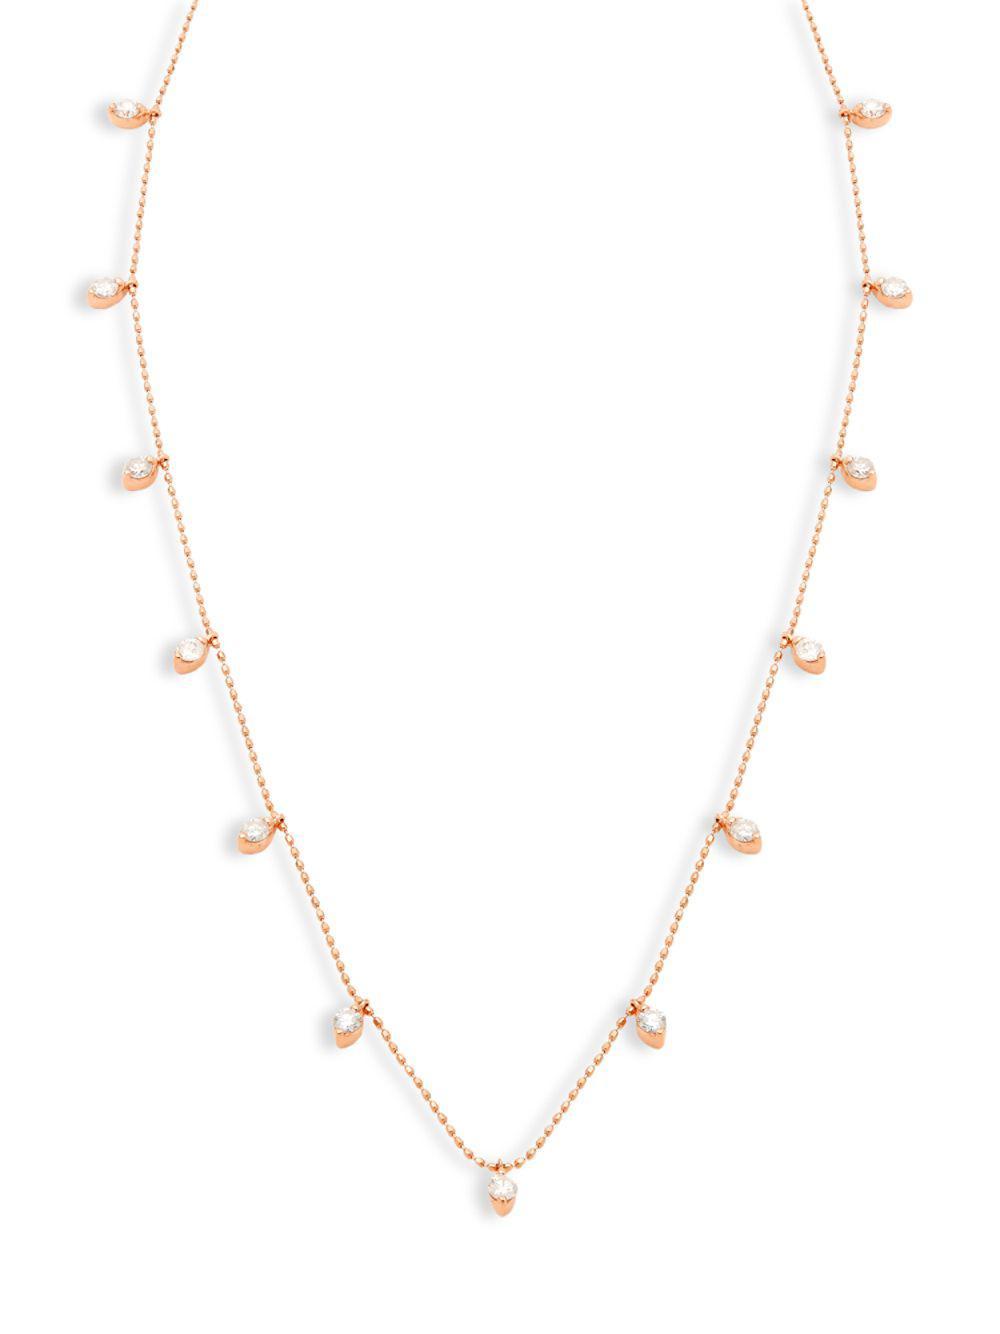 65a9de5153bc2 Lyst - Artisan 18k Rose Gold & Hanging Diamond Single-strand ...